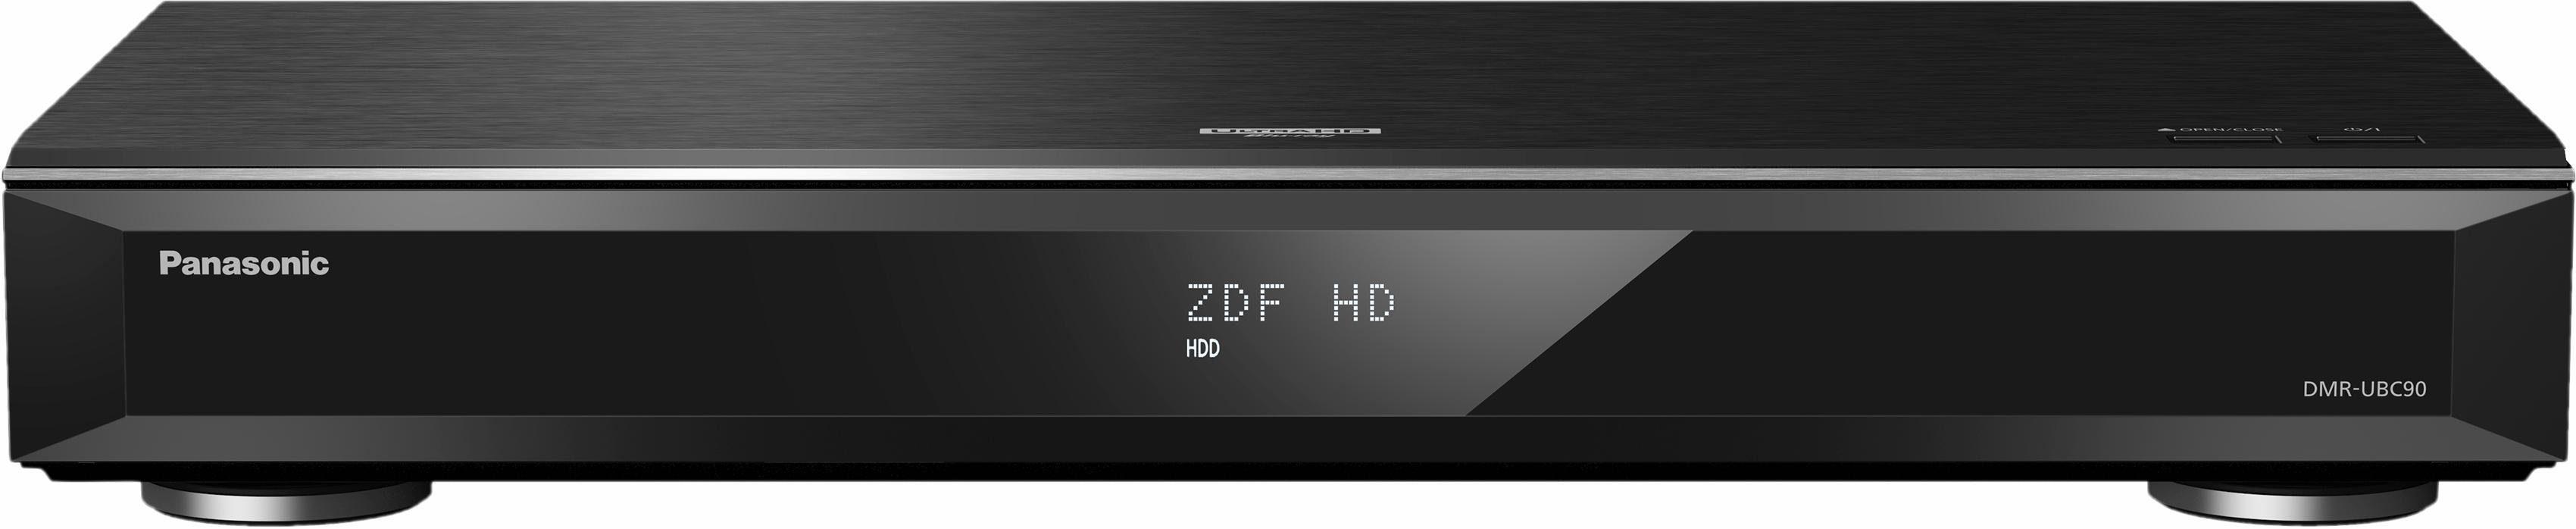 Panasonic DMR-UBC90 UHD Blu-ray Recorder mit Triple DVB-C/T2 HD Tuner